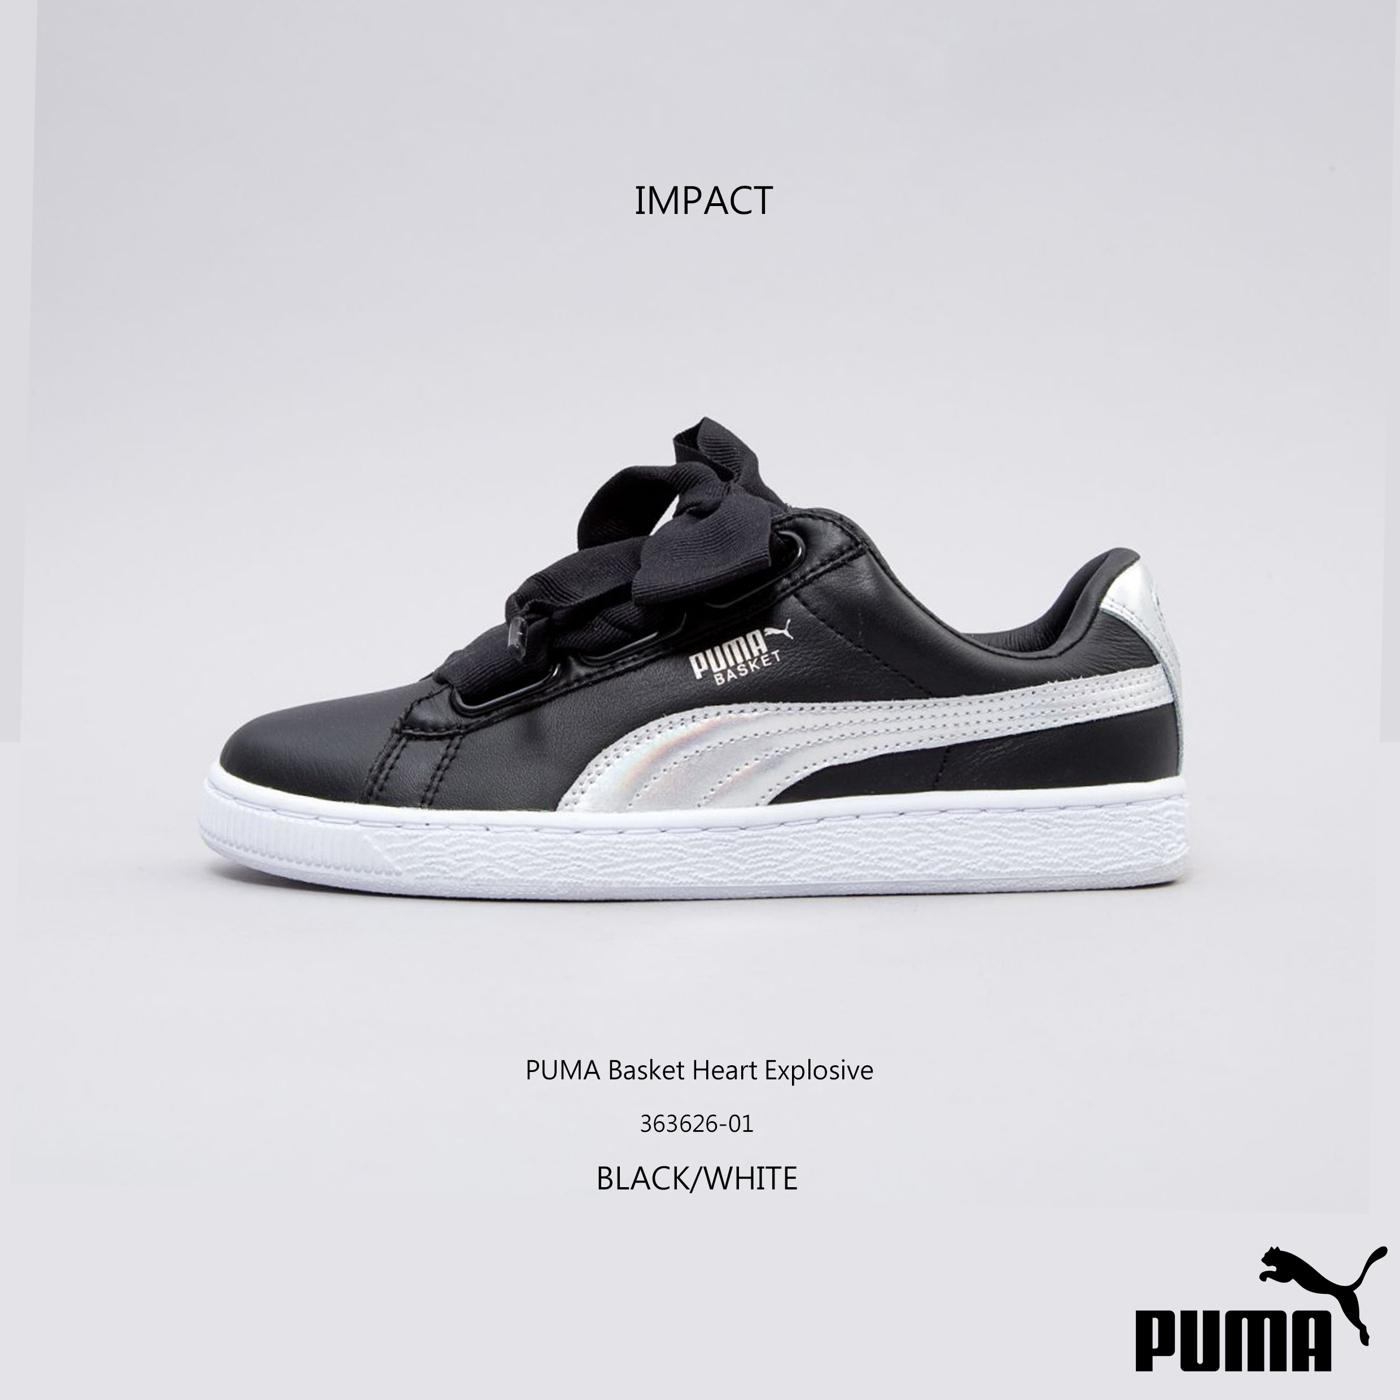 IMPACT PUMA Basket Heart Explosive Wn's 黑炫彩 蝴蝶結 休閒鞋 復古 女鞋 363626 01